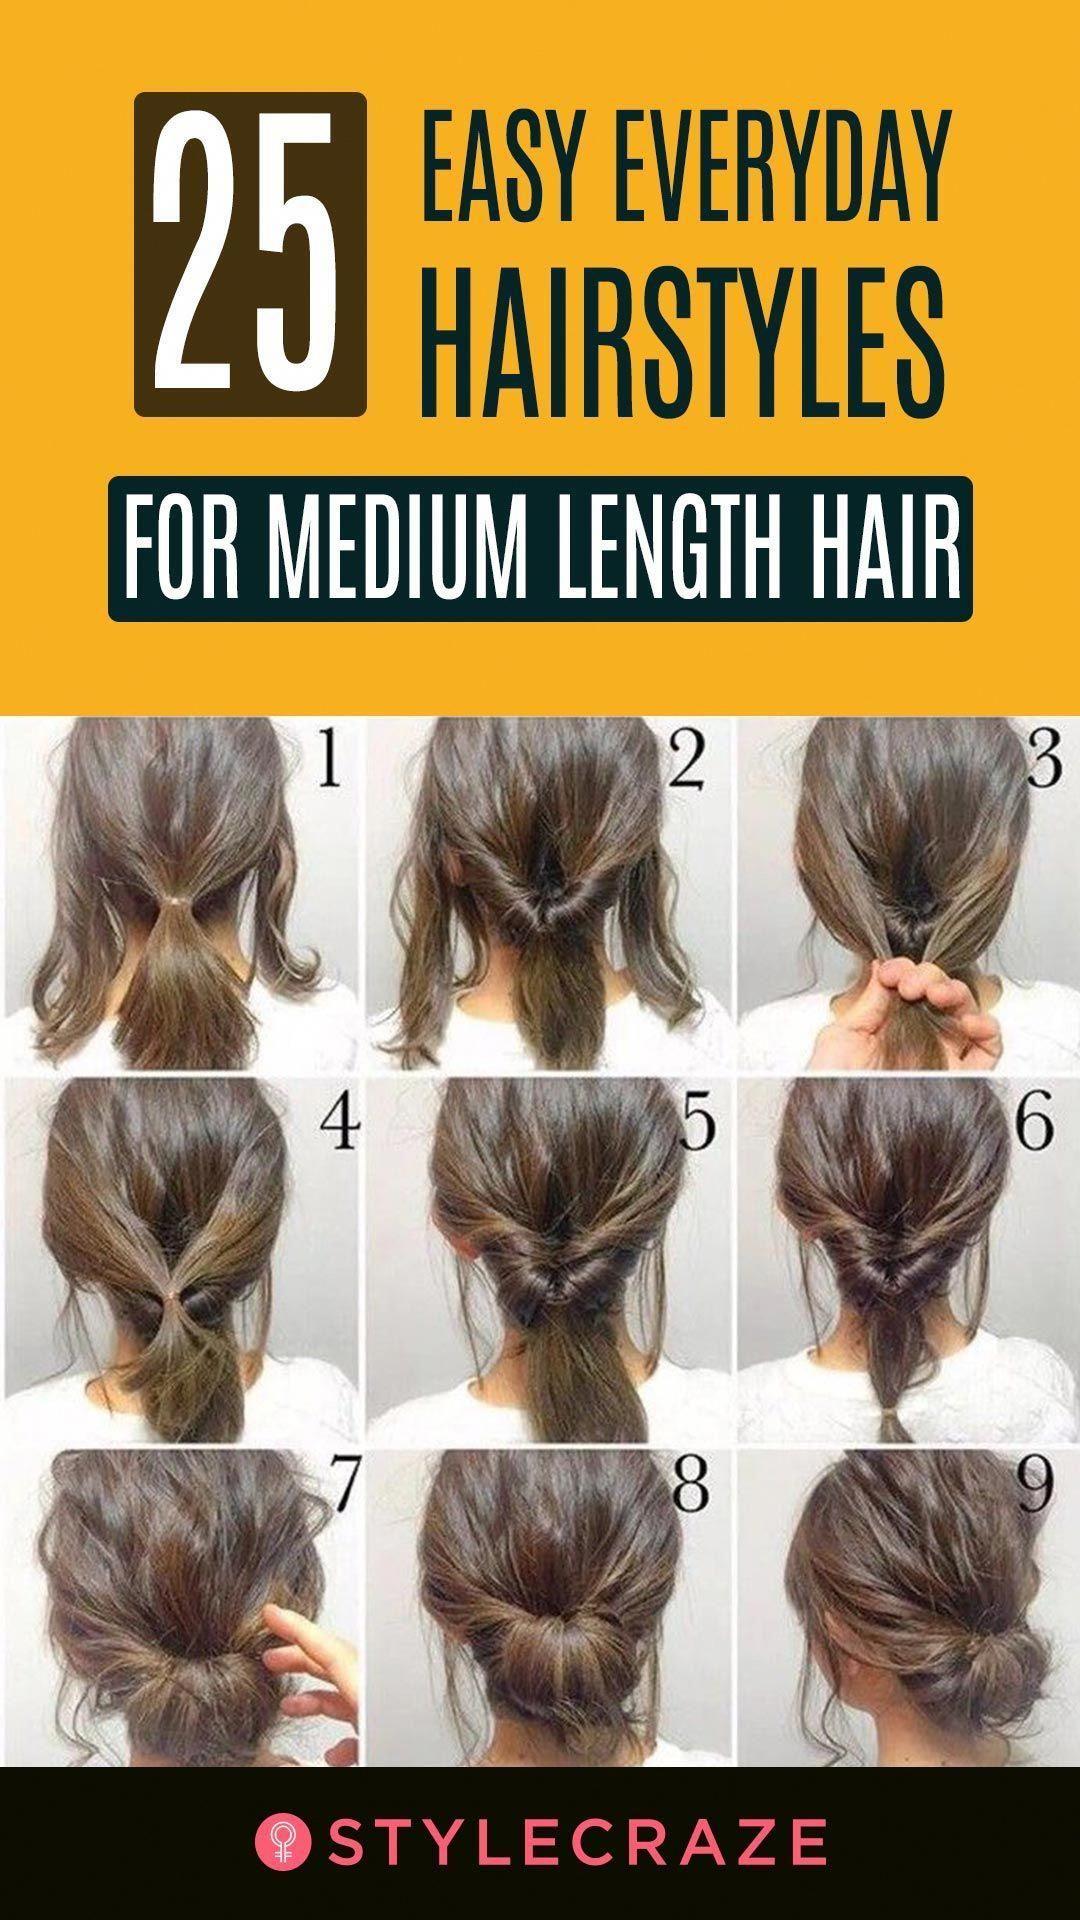 25 Easy Everyday Hairstyles For Medium Length Hair In 2020 Medium Length Hair Styles Hair Lengths Easy Everyday Hairstyles